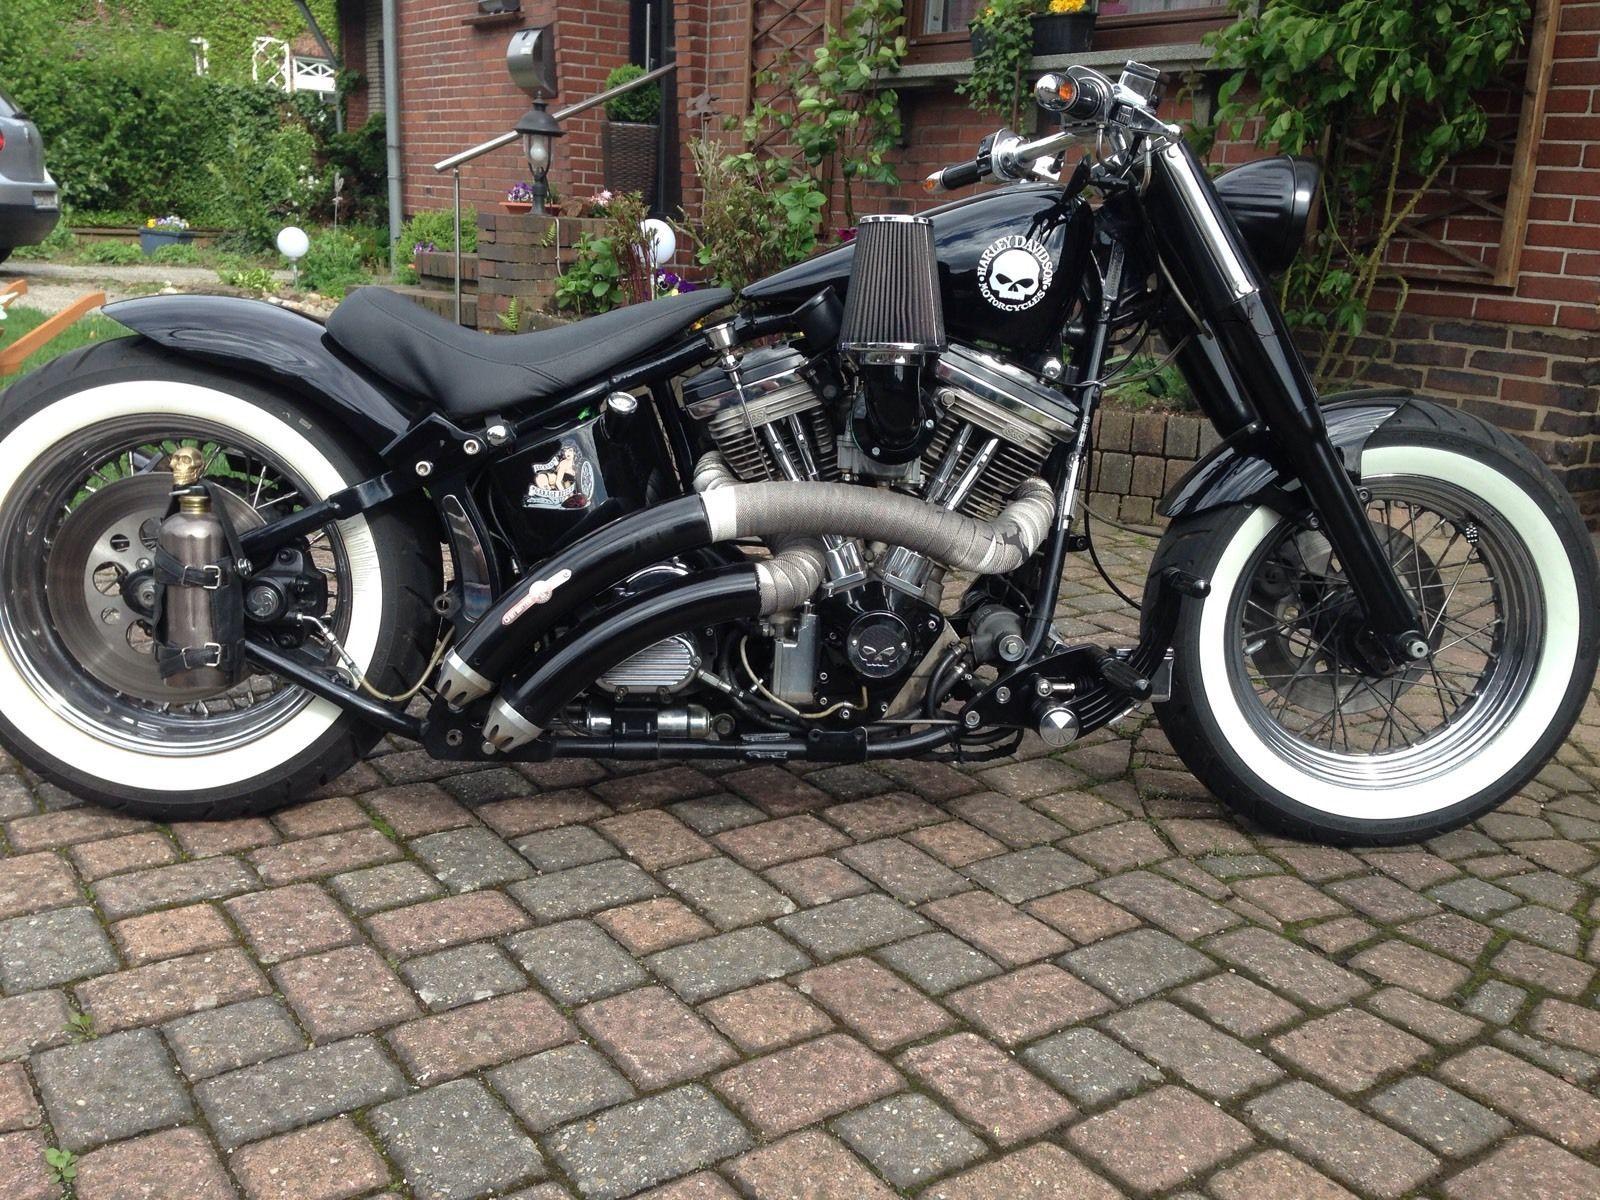 Ebayde Itm Bsl Rainbow Down Under Harley Evo Softail Fatboy Bobber Custom Usw 301621539948ptLH DefaultDomain 77